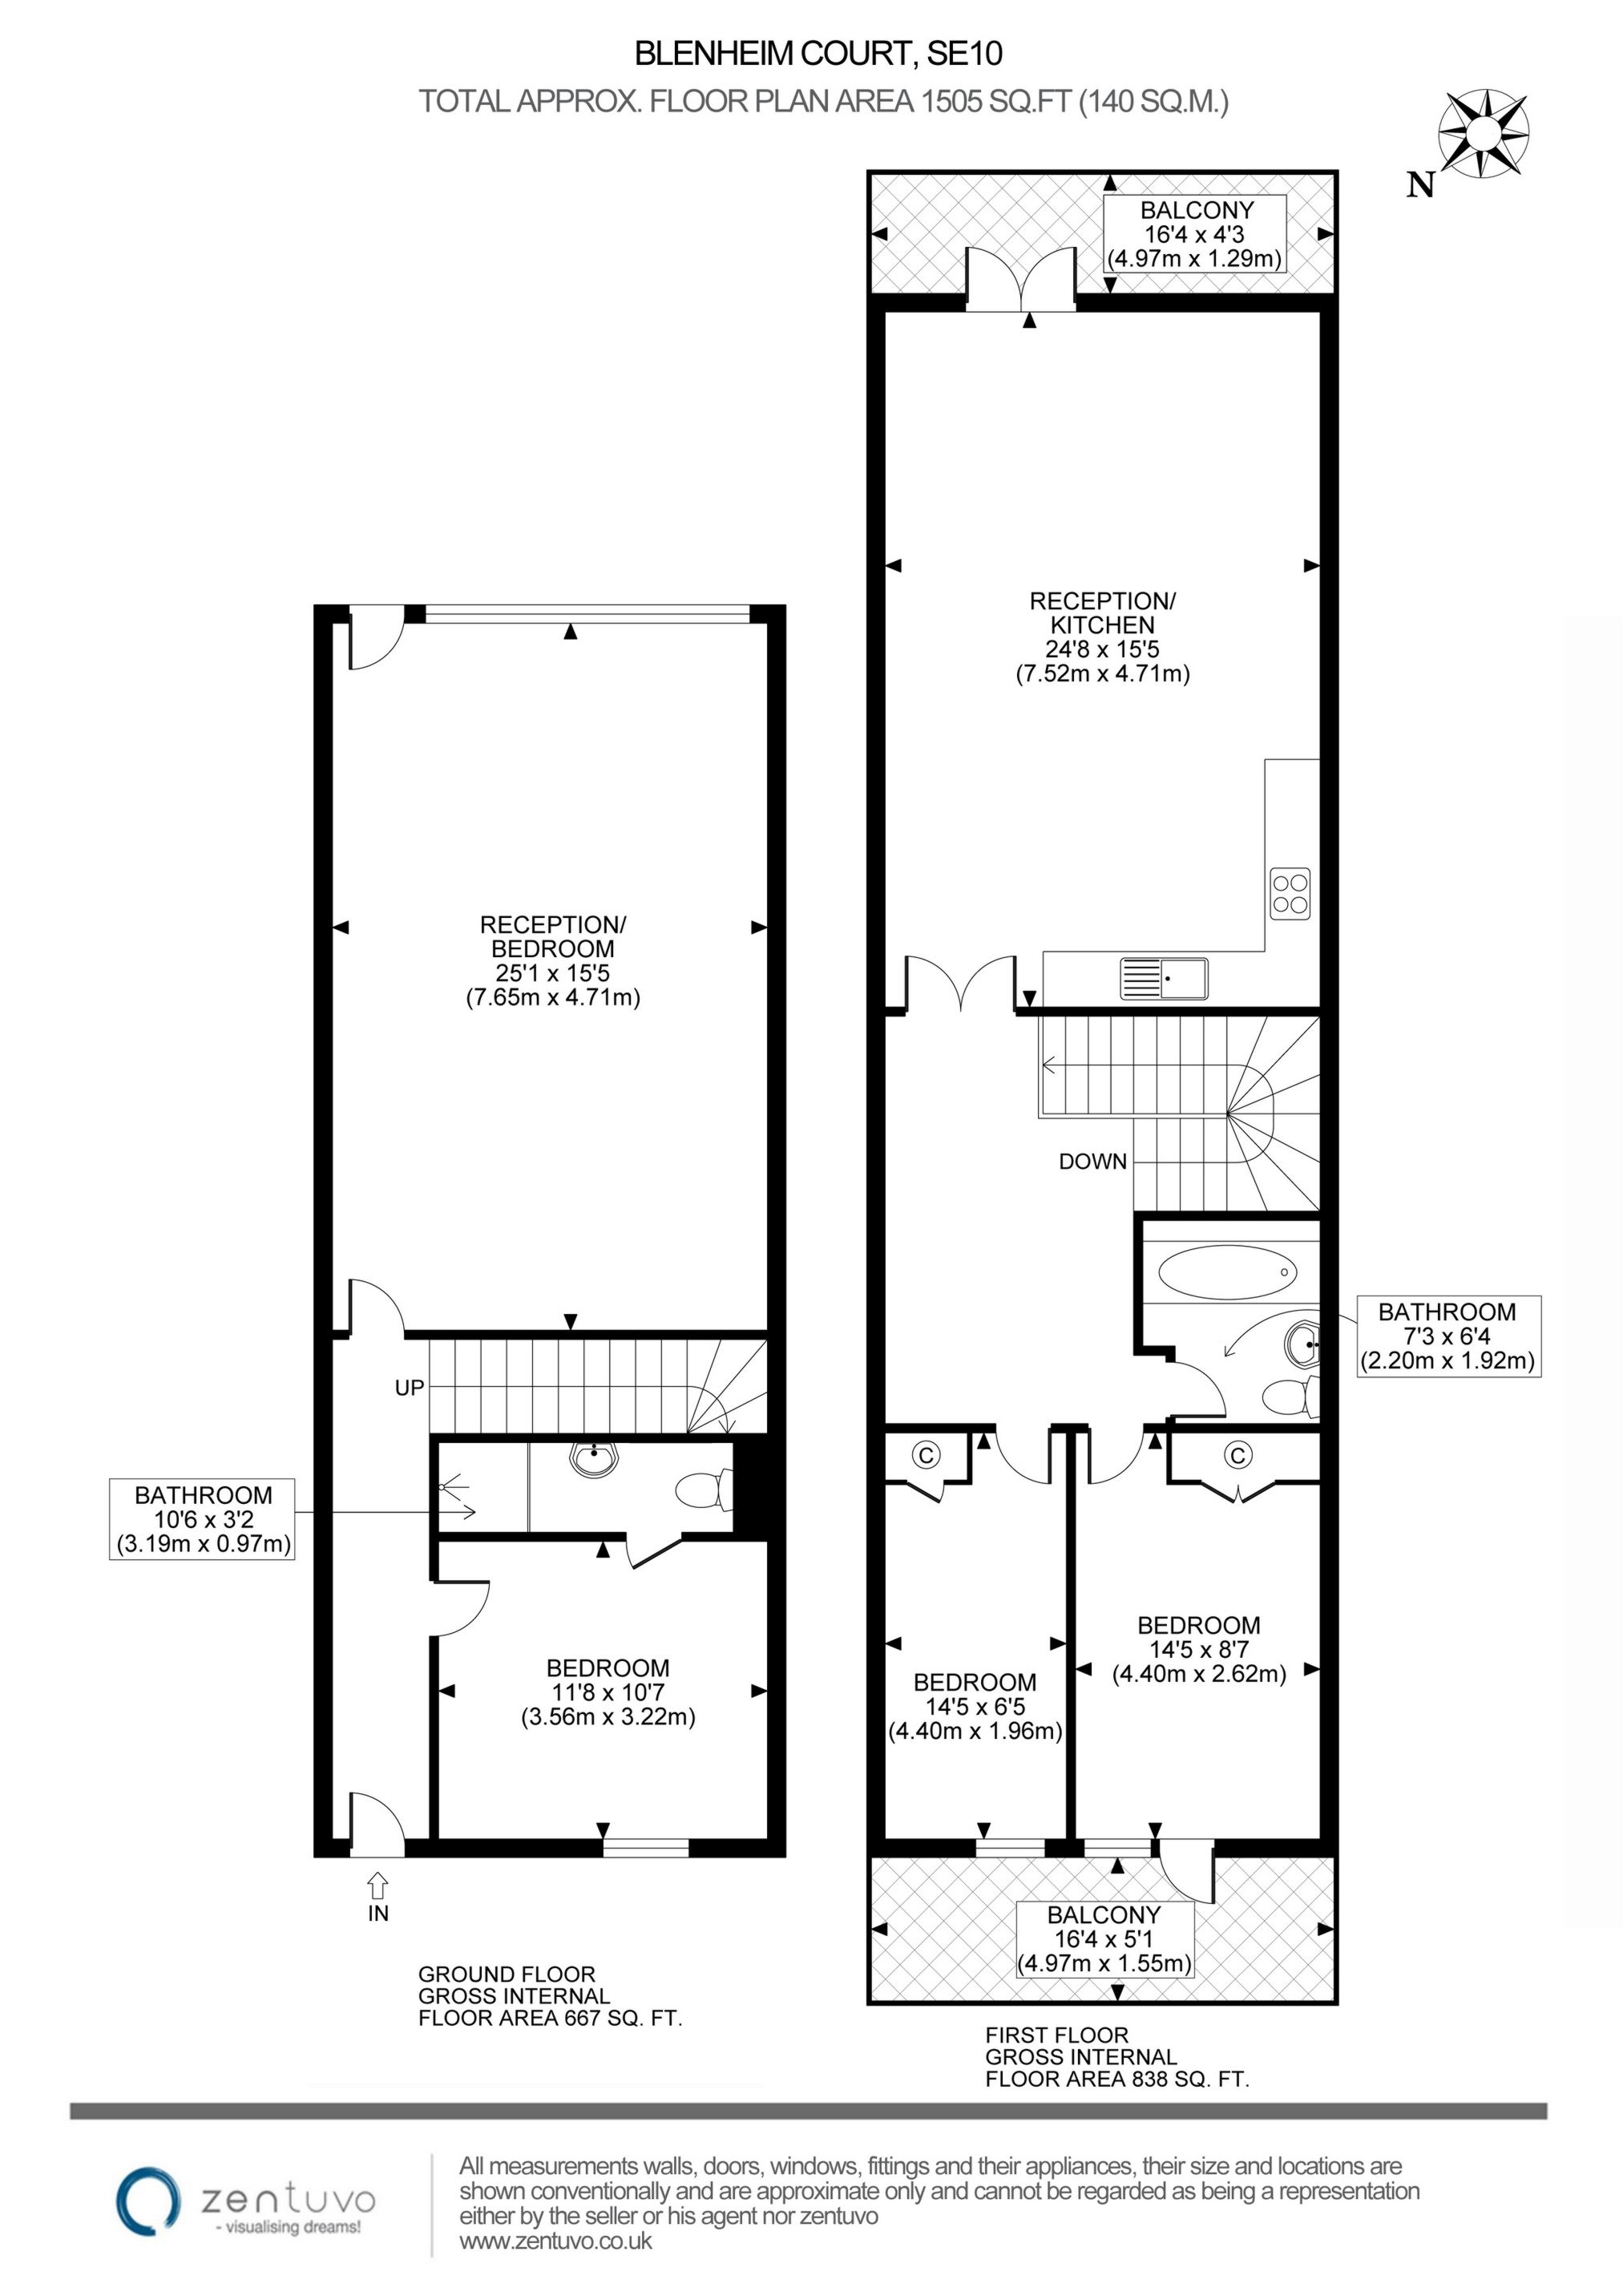 Blenheim court woolwich road greenwich se10 4 bedroom for Up down duplex floor plans